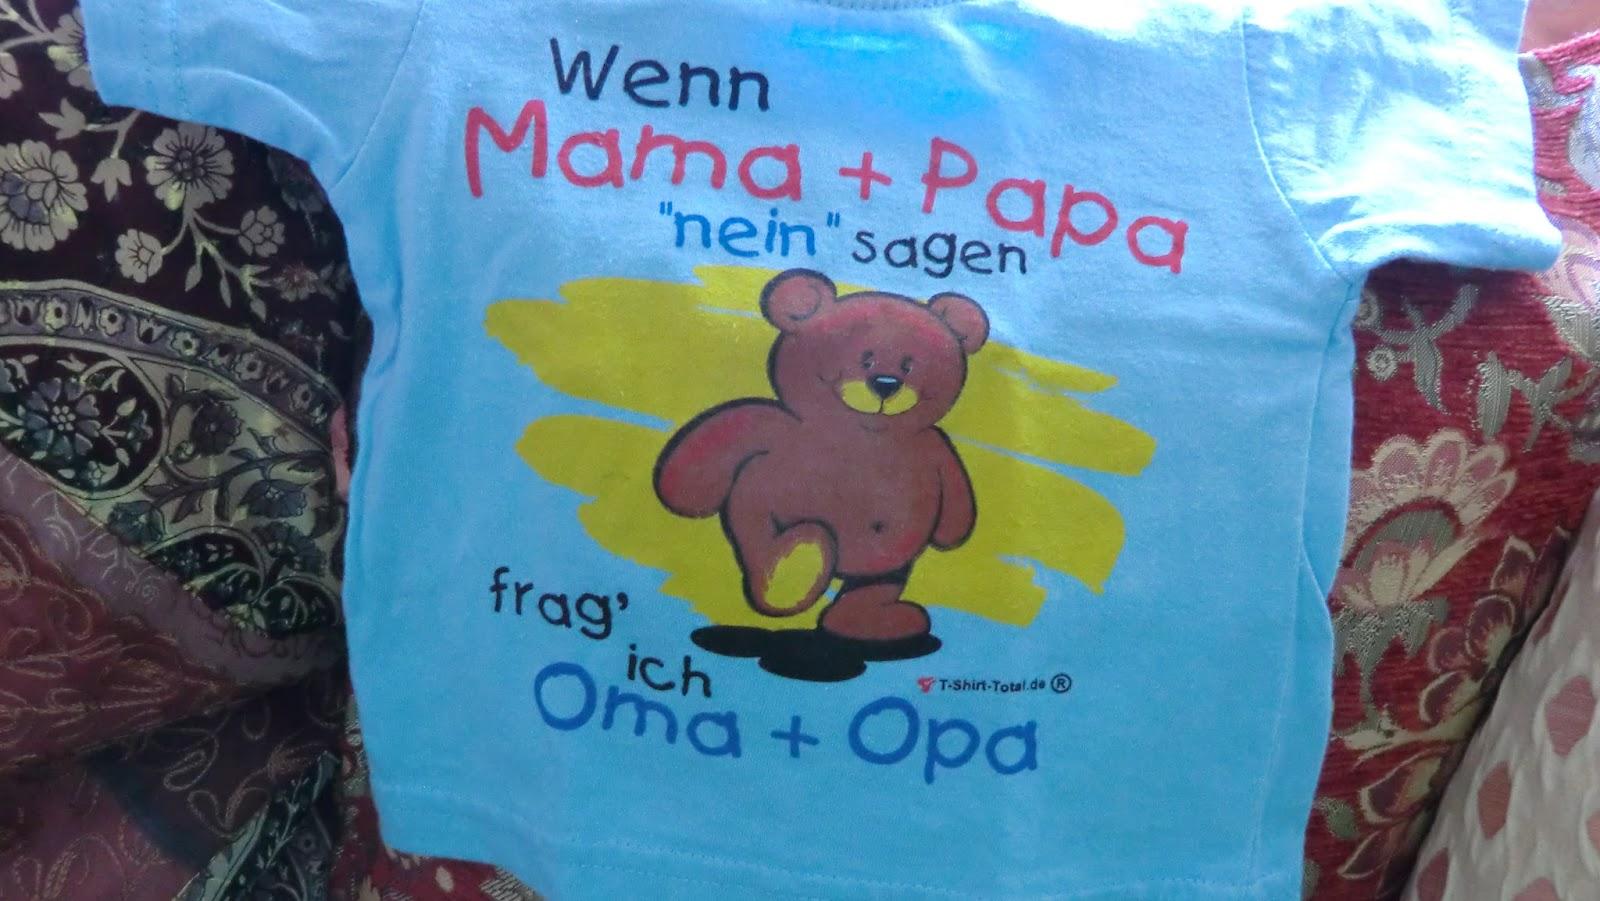 Fasten Seat Belts Baby Bär 29 Oma Heute Kommt Uns Die Mama